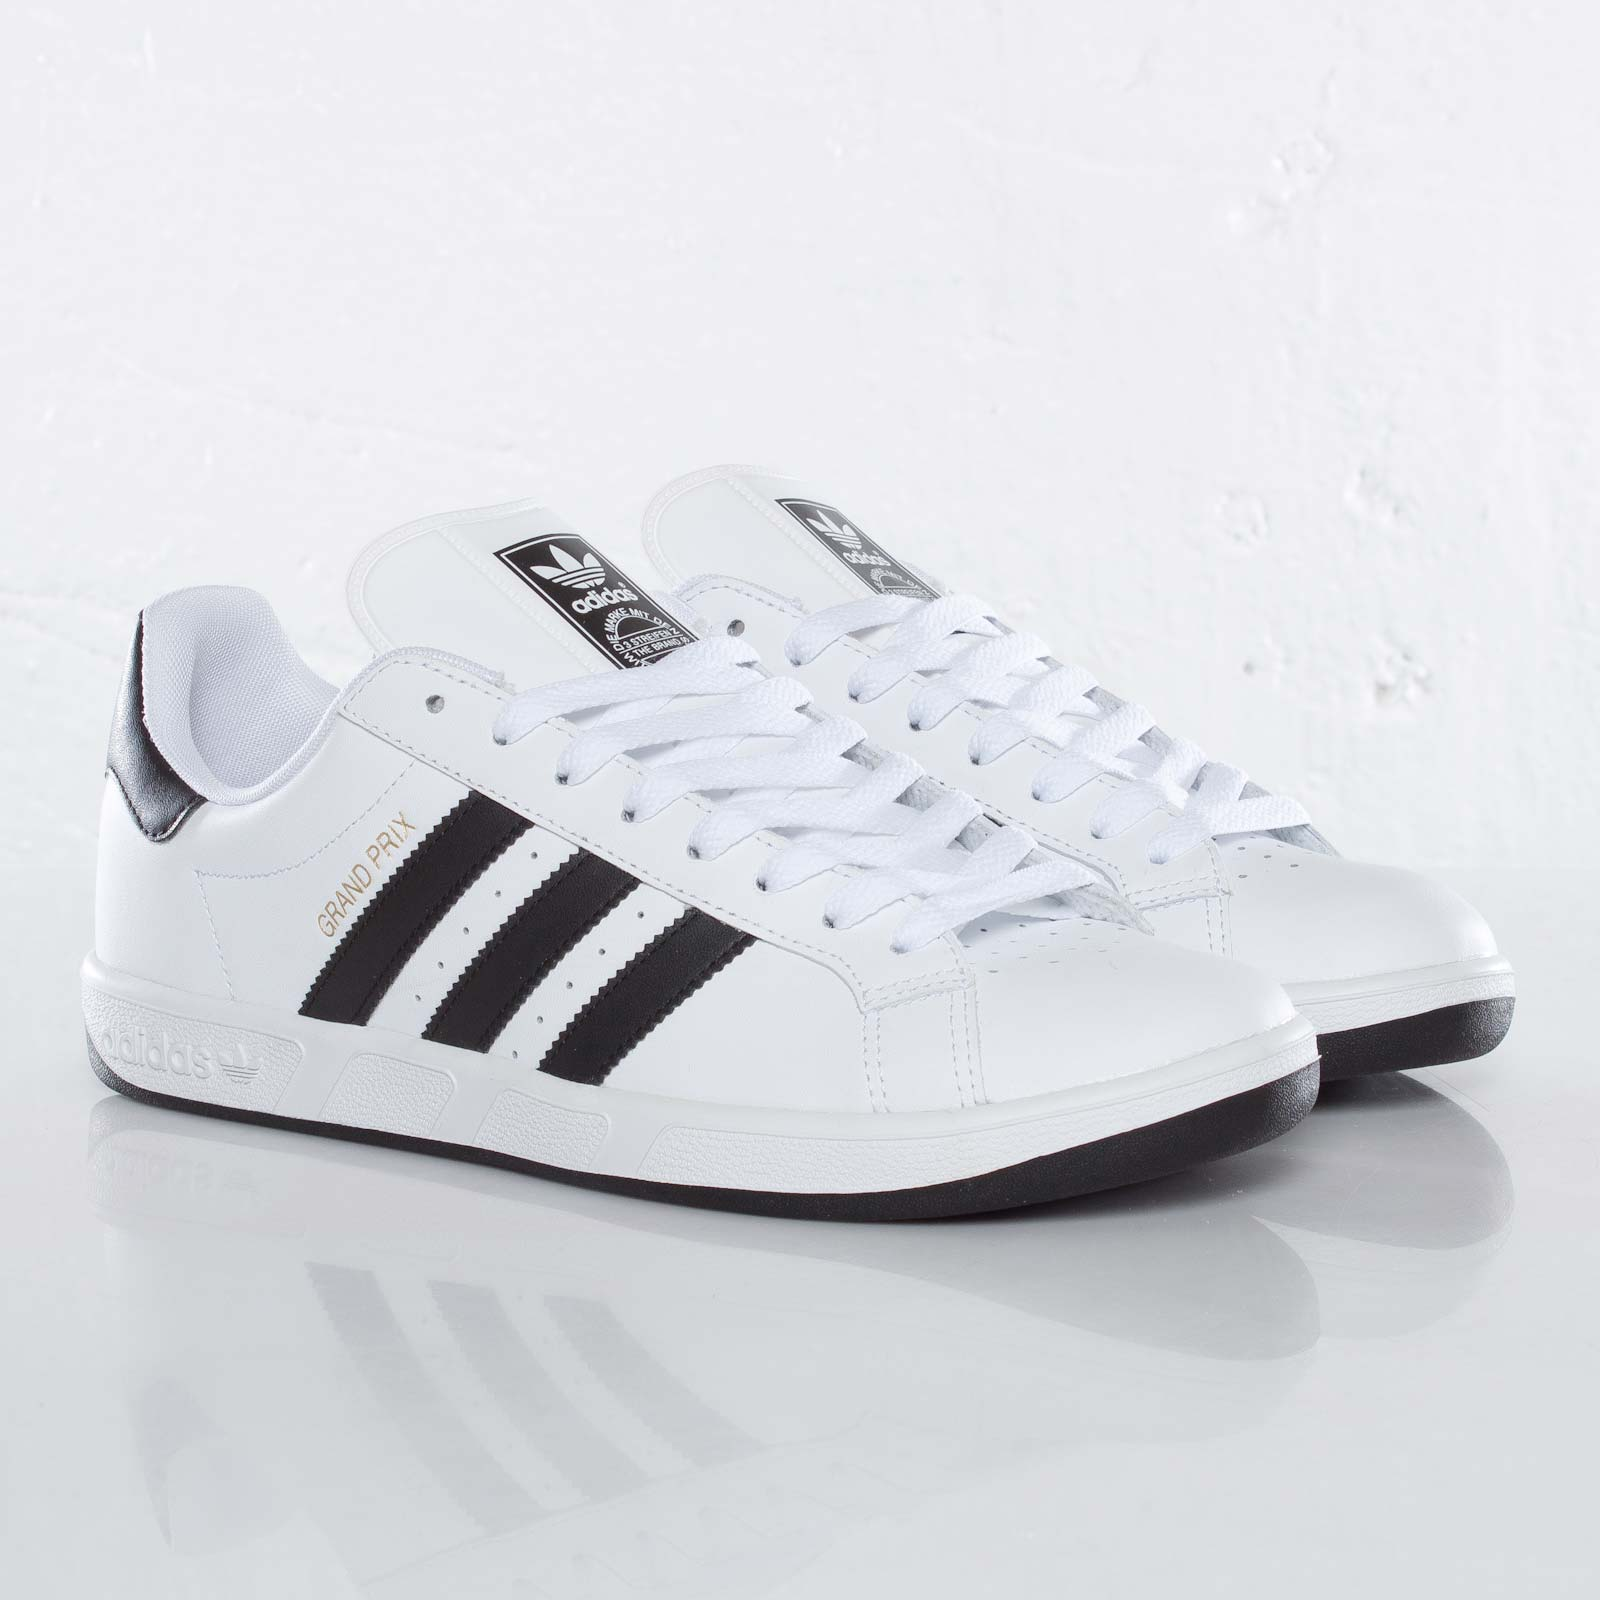 adidas grand prix g59935 sneakersnstuff sneakers. Black Bedroom Furniture Sets. Home Design Ideas